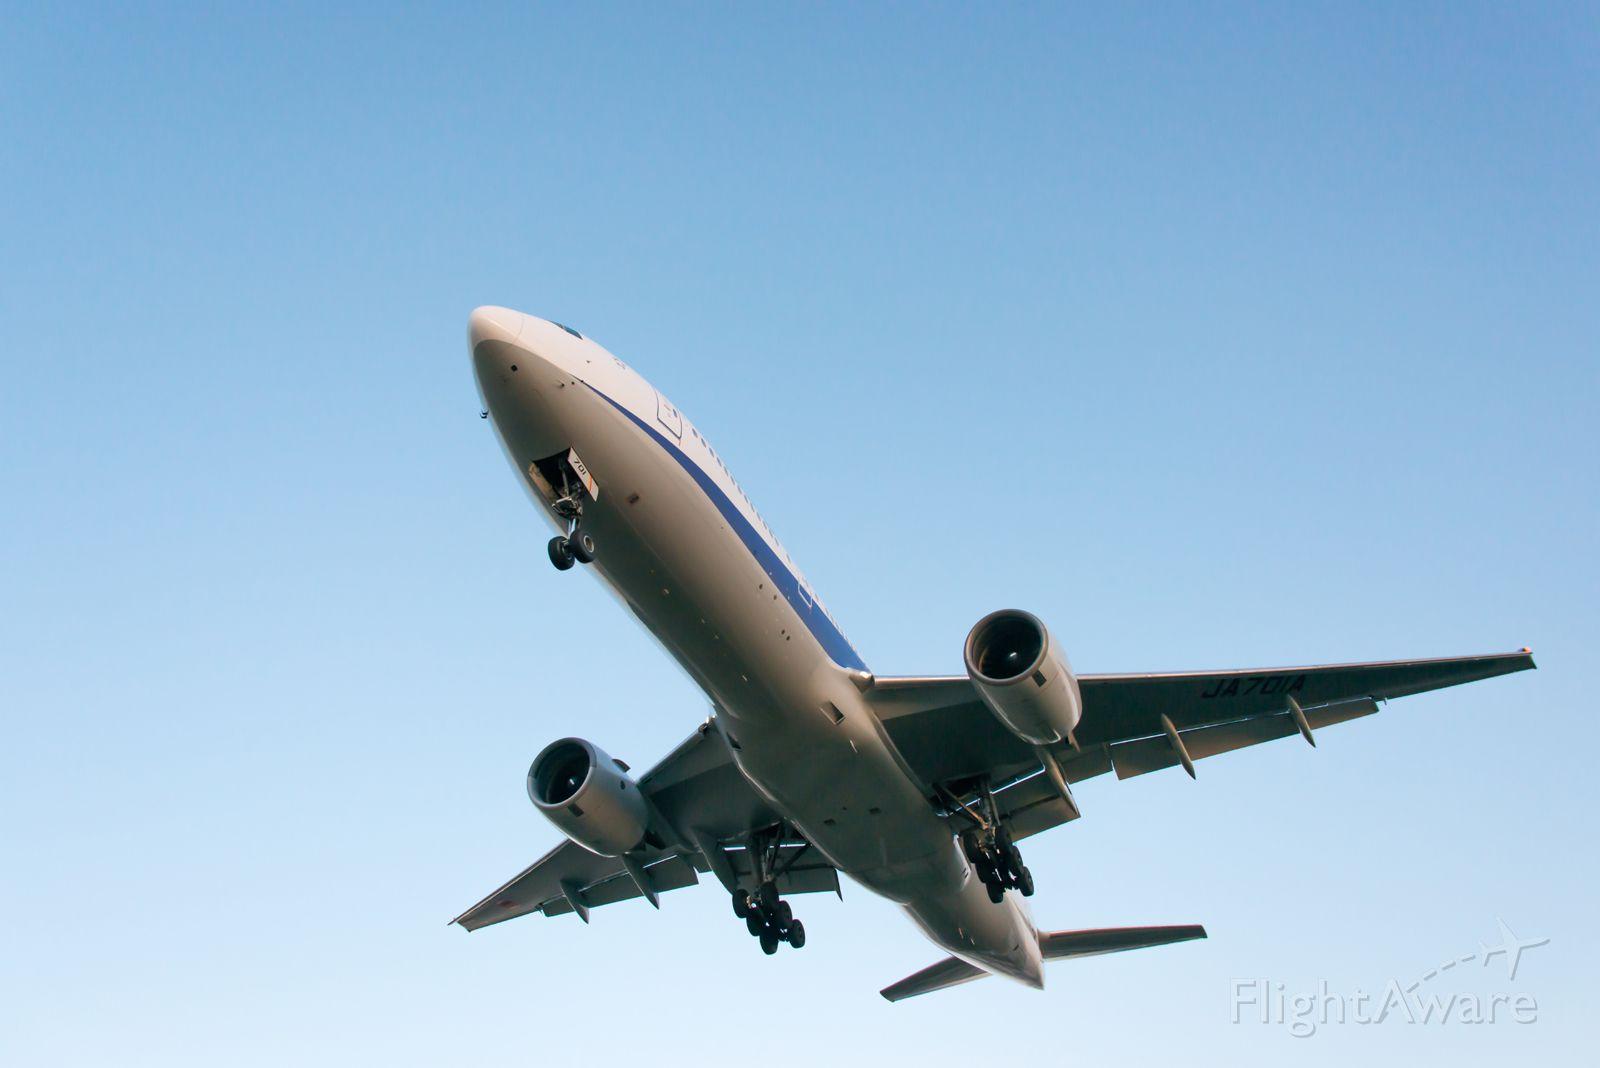 Boeing 777-200 (JA701A)